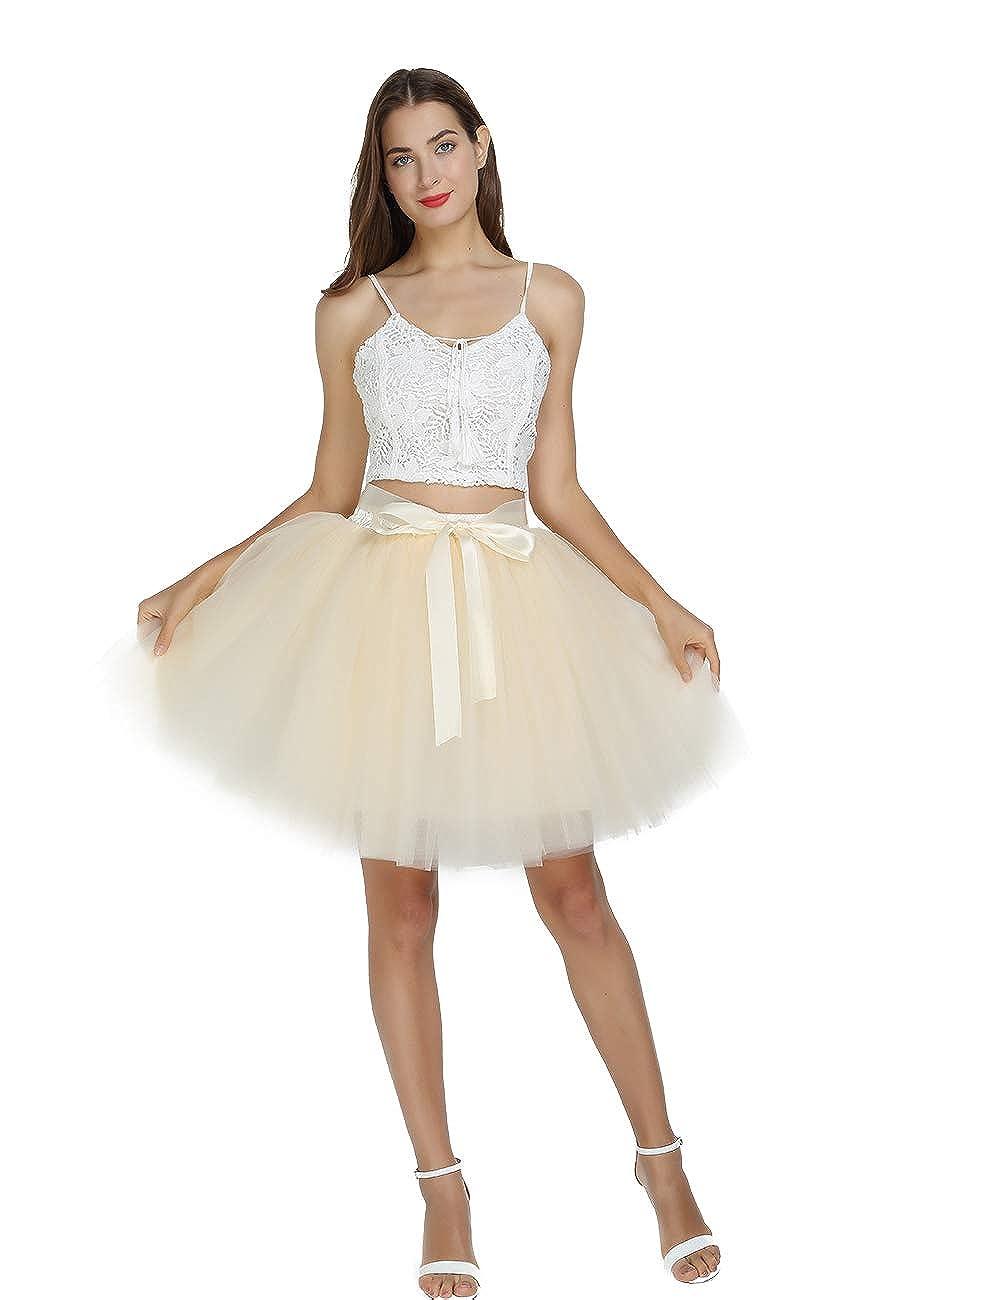 acb64748eea6 Women's High Waist Princess Tulle Skirt Adult Dance Petticoat A-line  Wedding Party Tutu at Amazon Women's Clothing store: